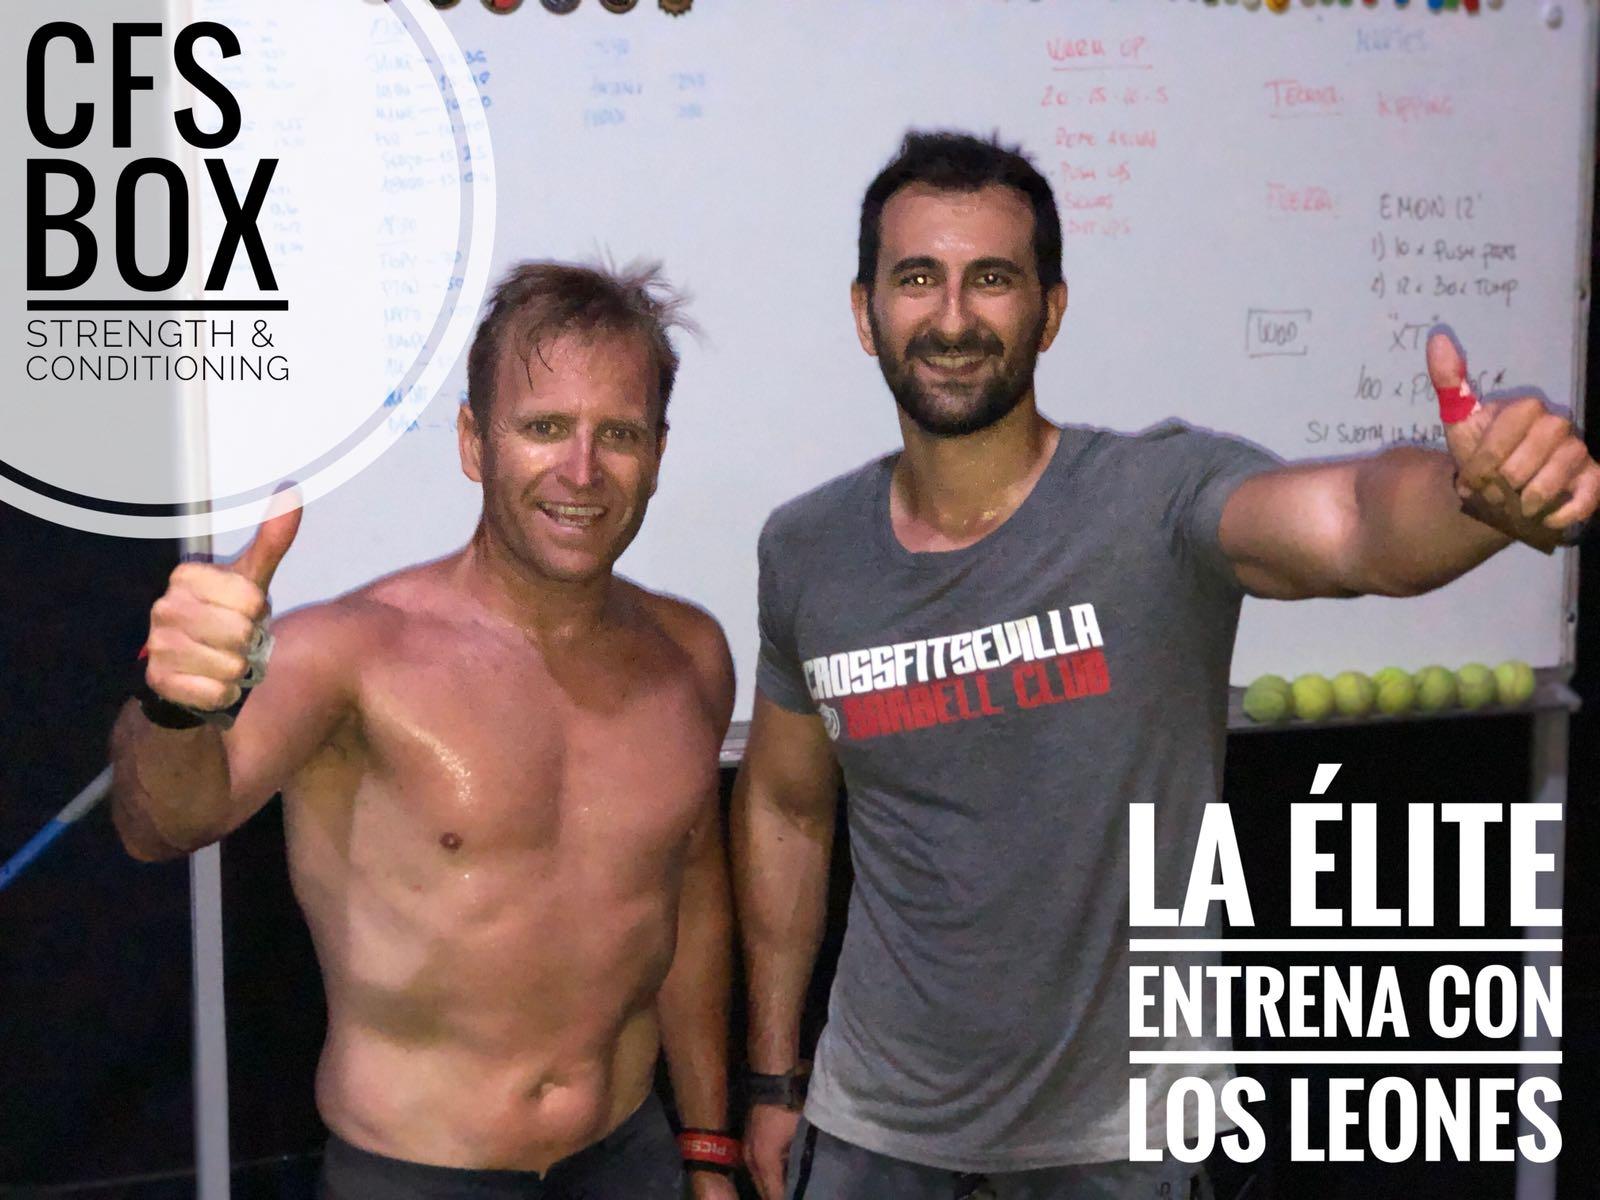 Wod CFS Box CrossFit Sevilla training elite leones